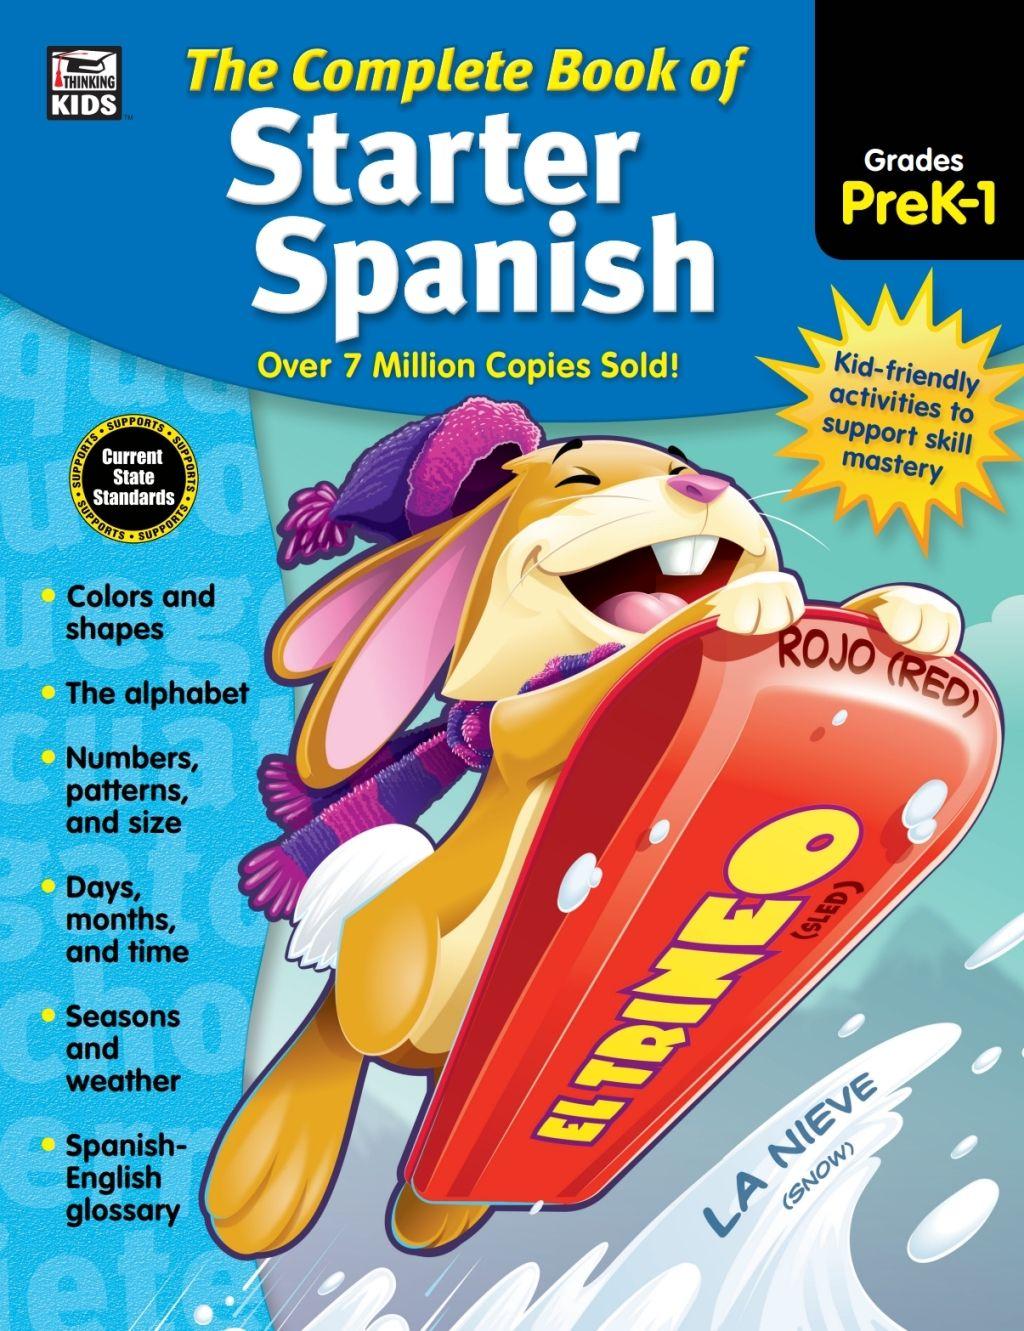 The Complete Book Of Starter Spanish Grades Preschool